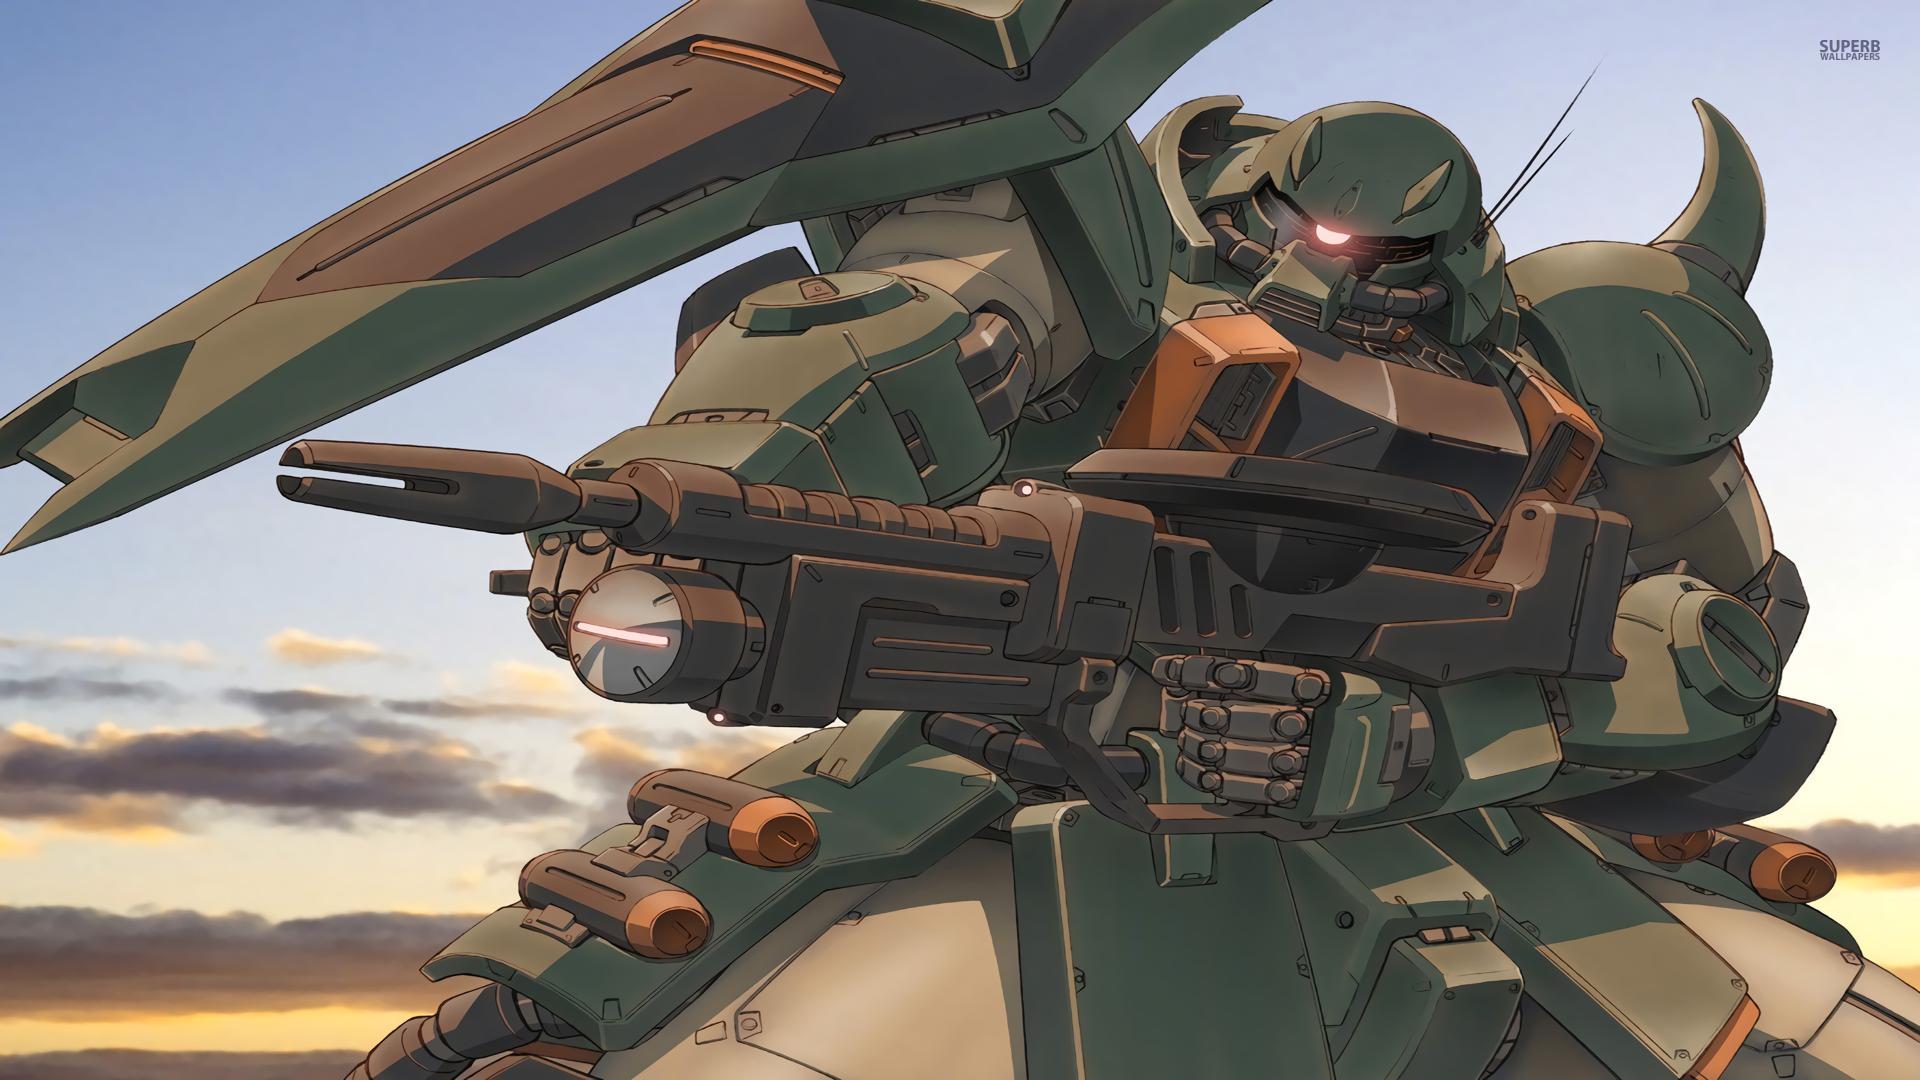 Wallpaper : Gundam, Mo...